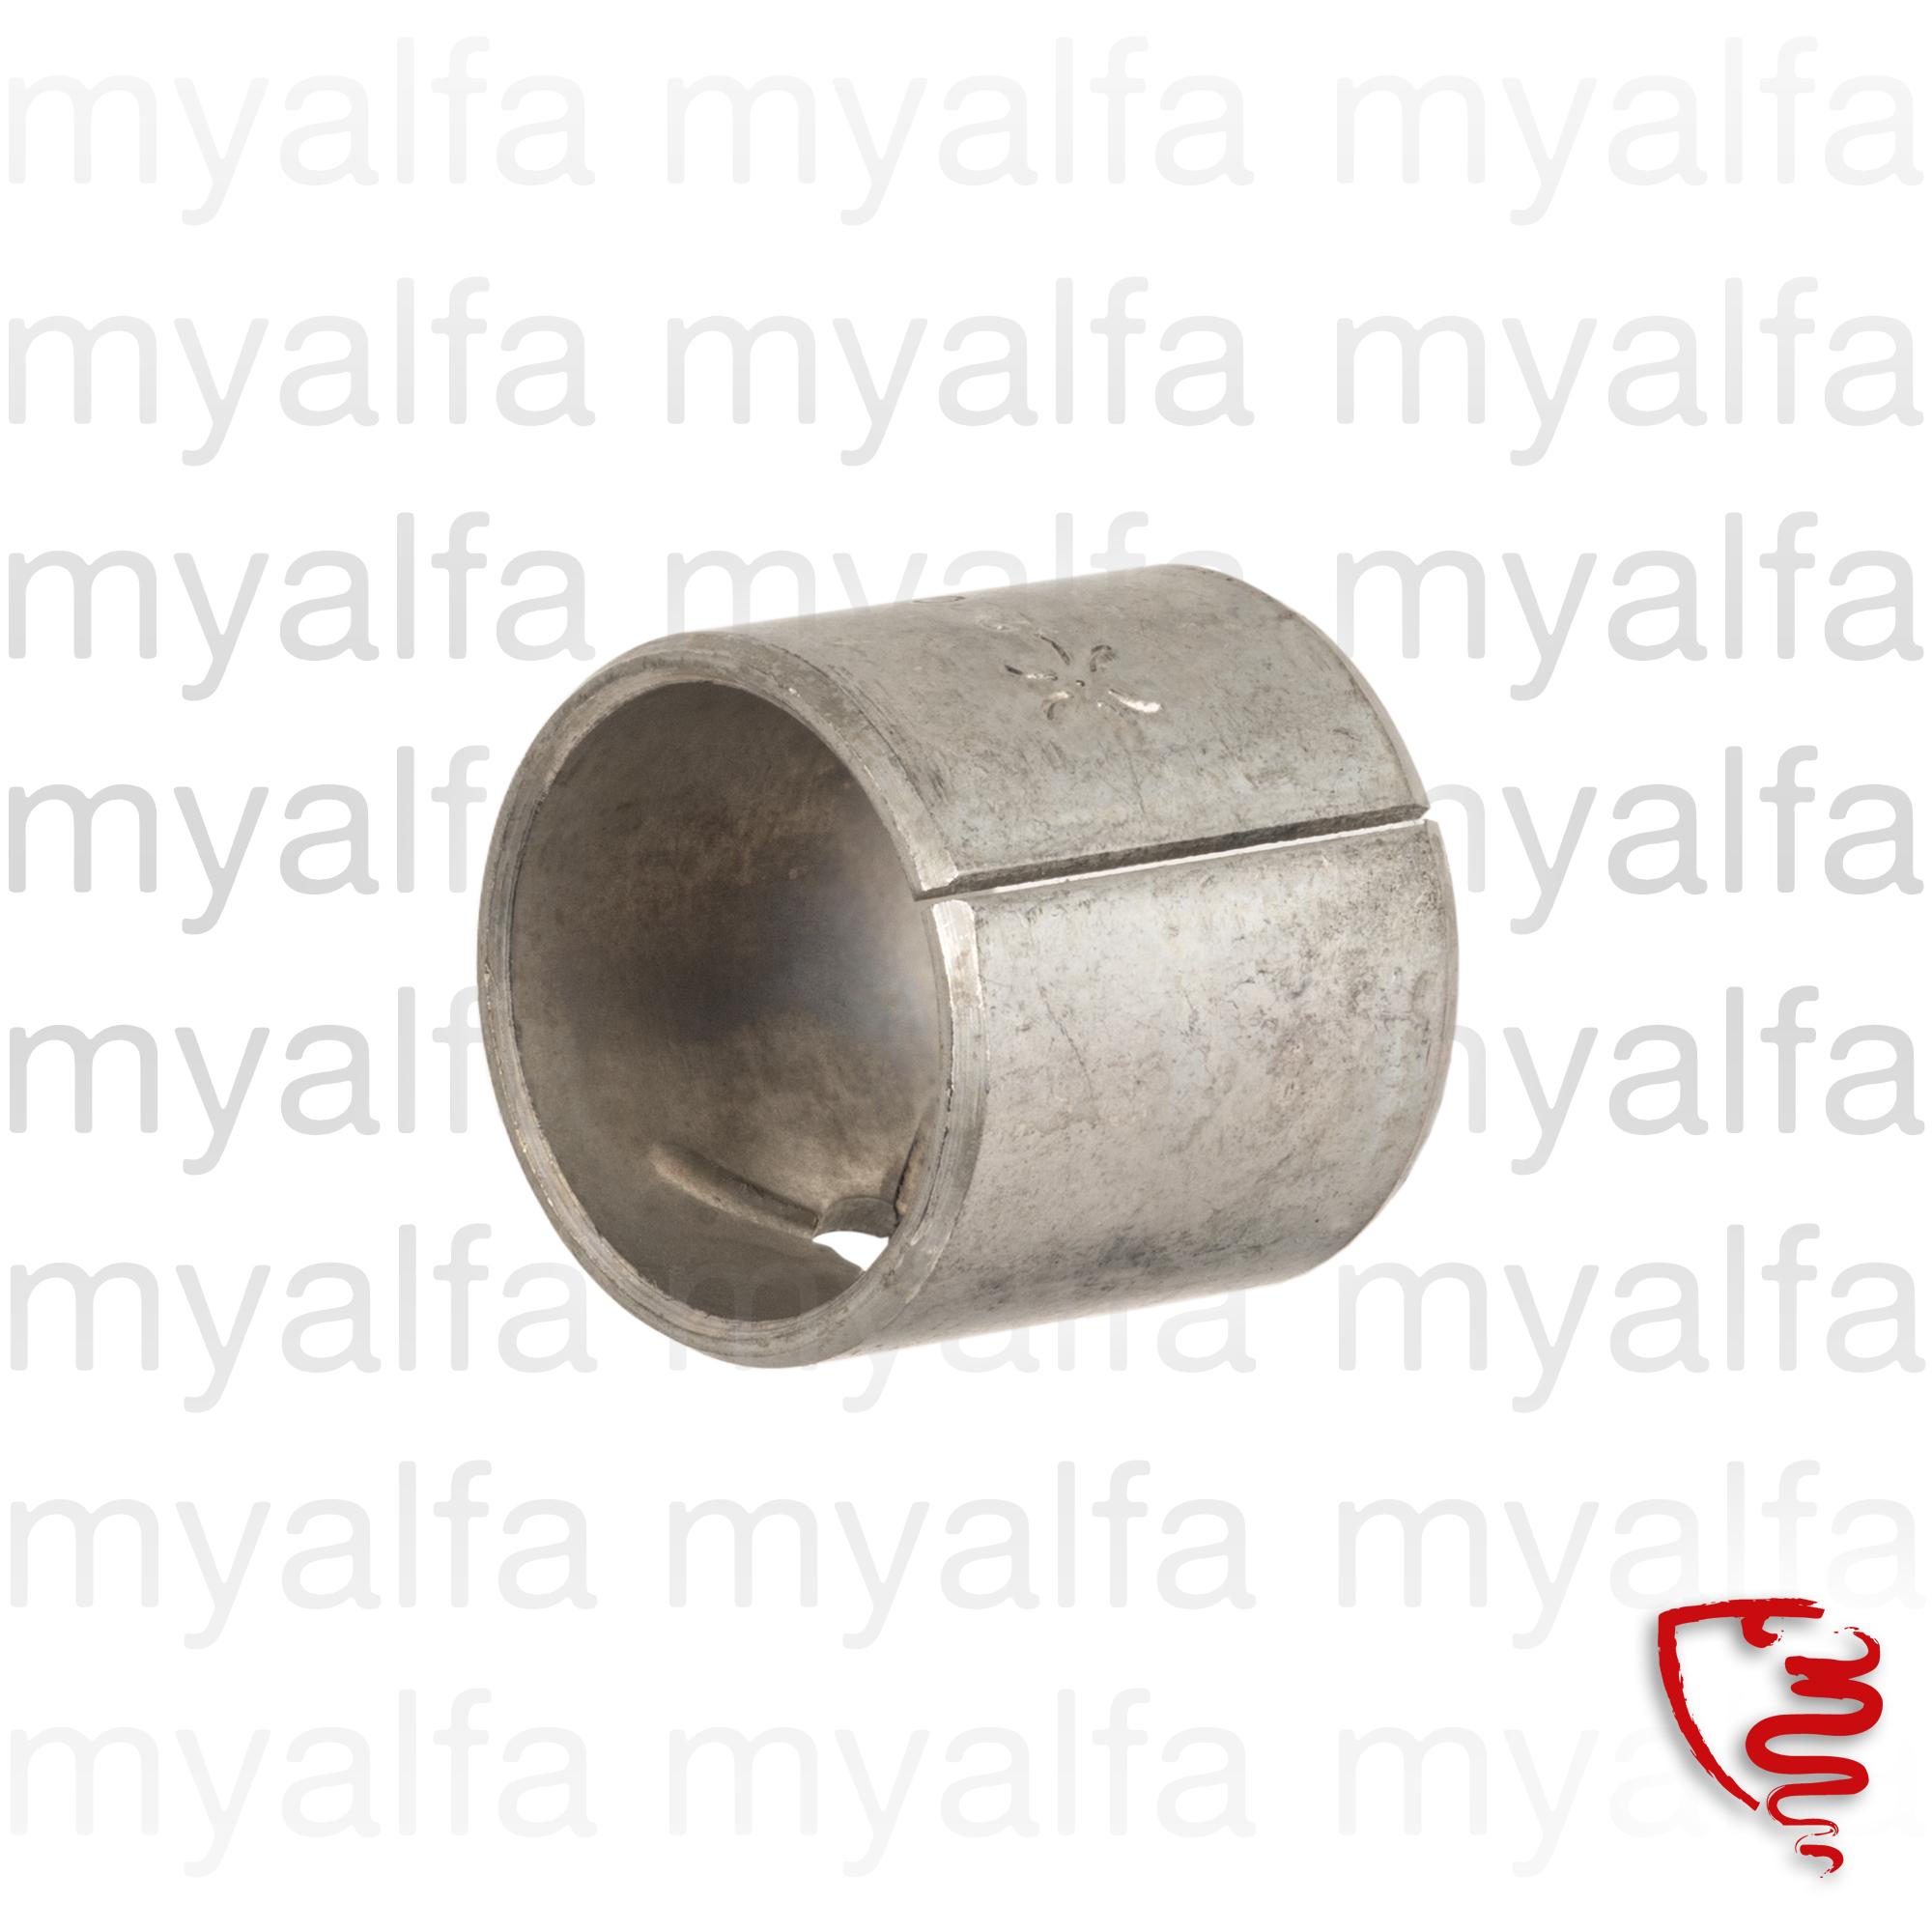 Bronze rod head 1600 - 2000 for 105/115, Engine, Engine Block, Con Rod/Bearing